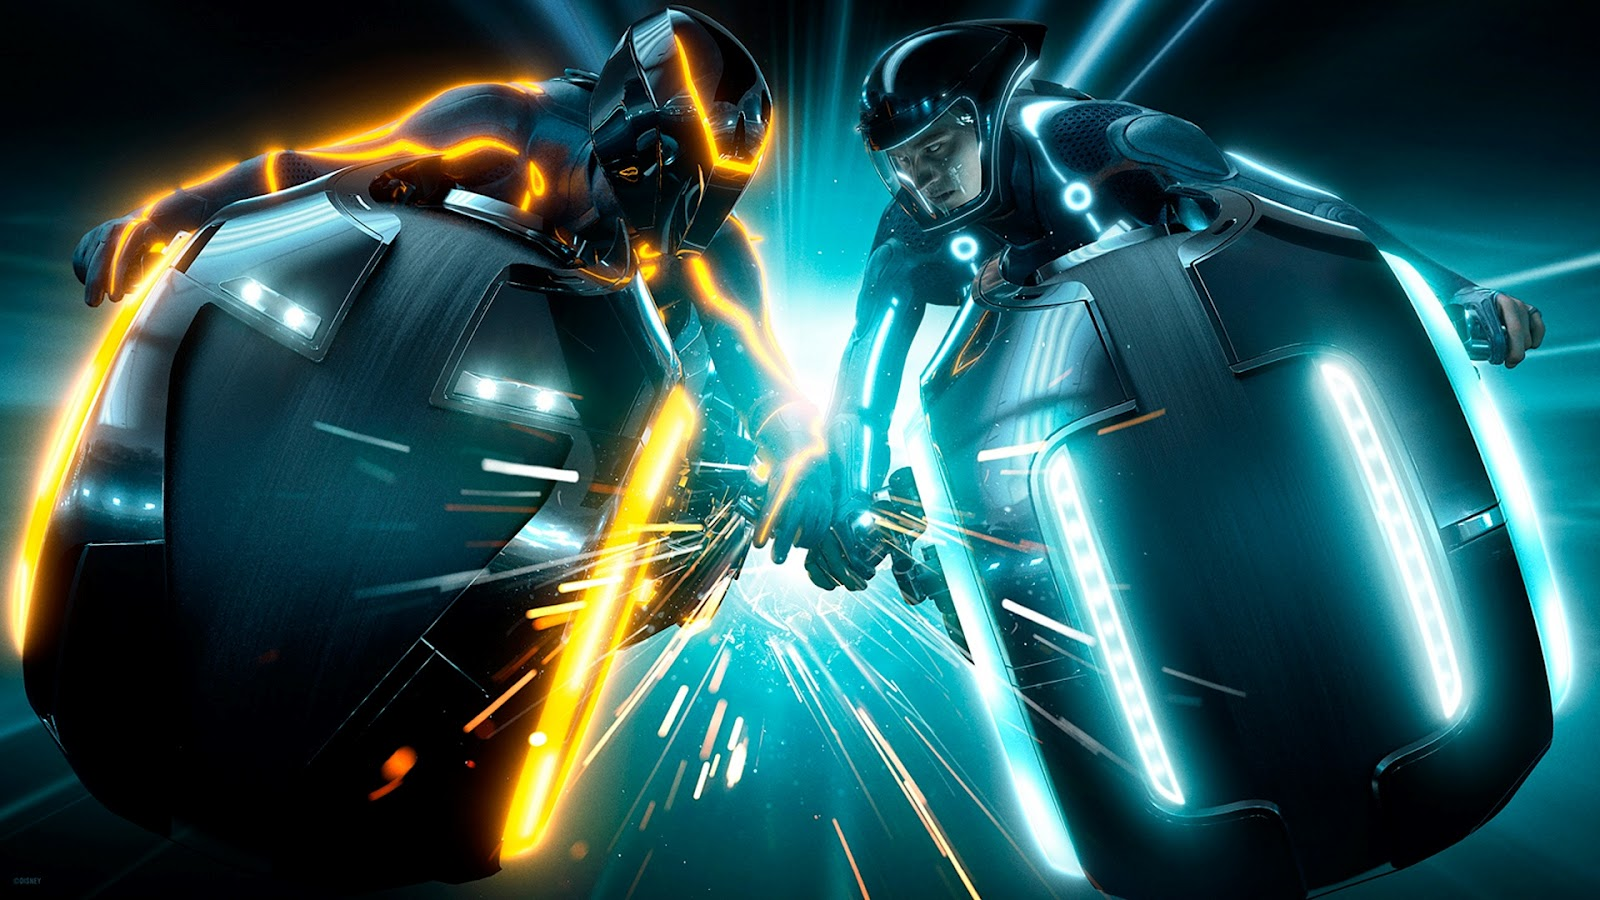 Lightning Flash Tron Legacy HD 1080p Wallpapers X9Wallpapers 1600x900